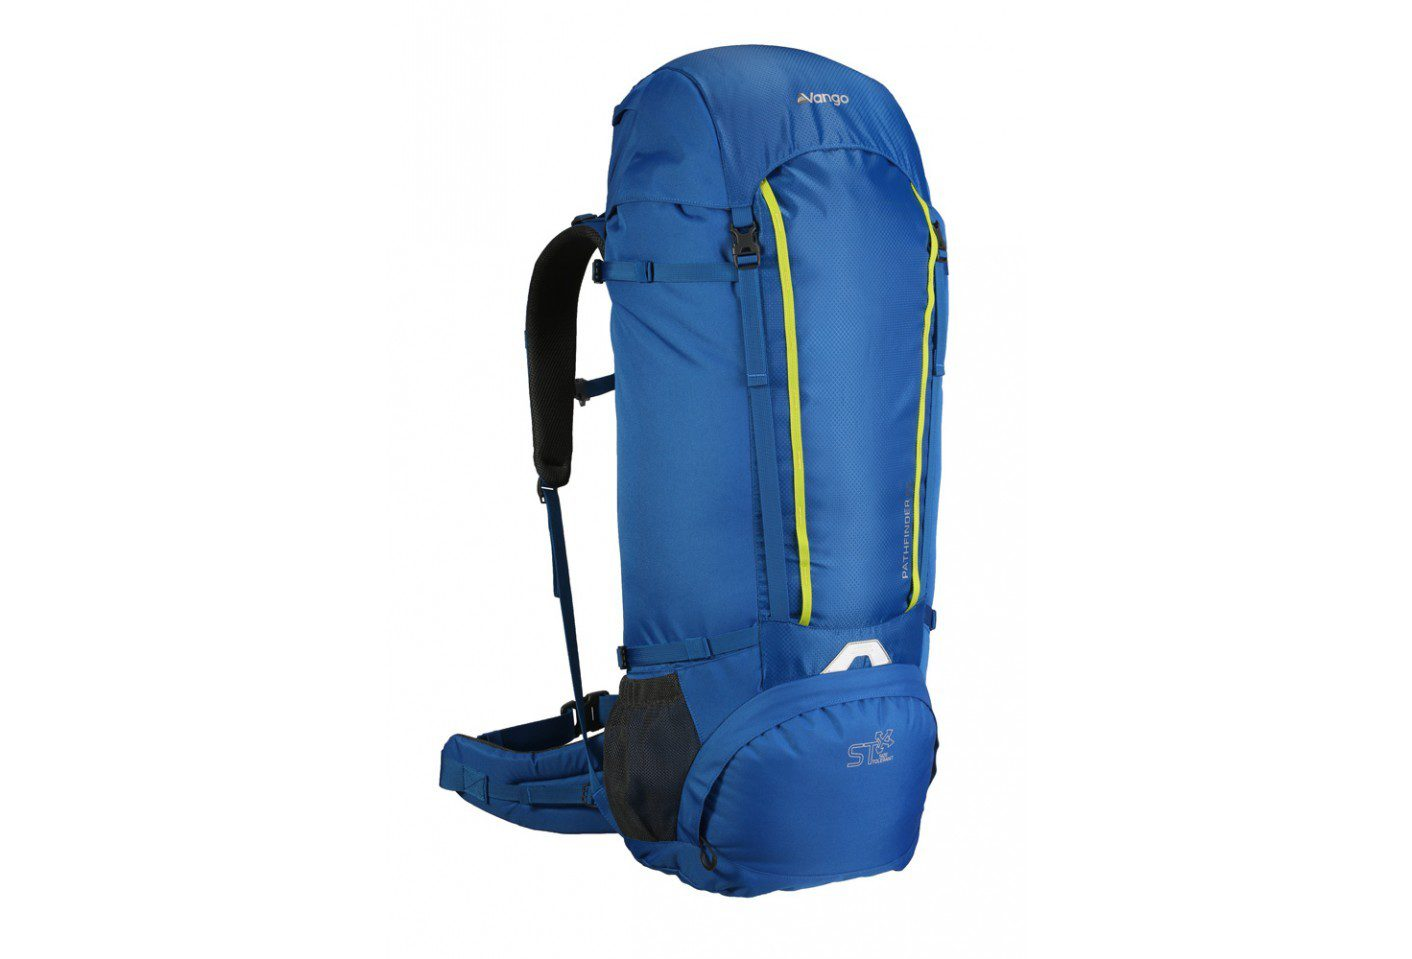 Vango Pathfinder 65 rucksack - Cobalt blue